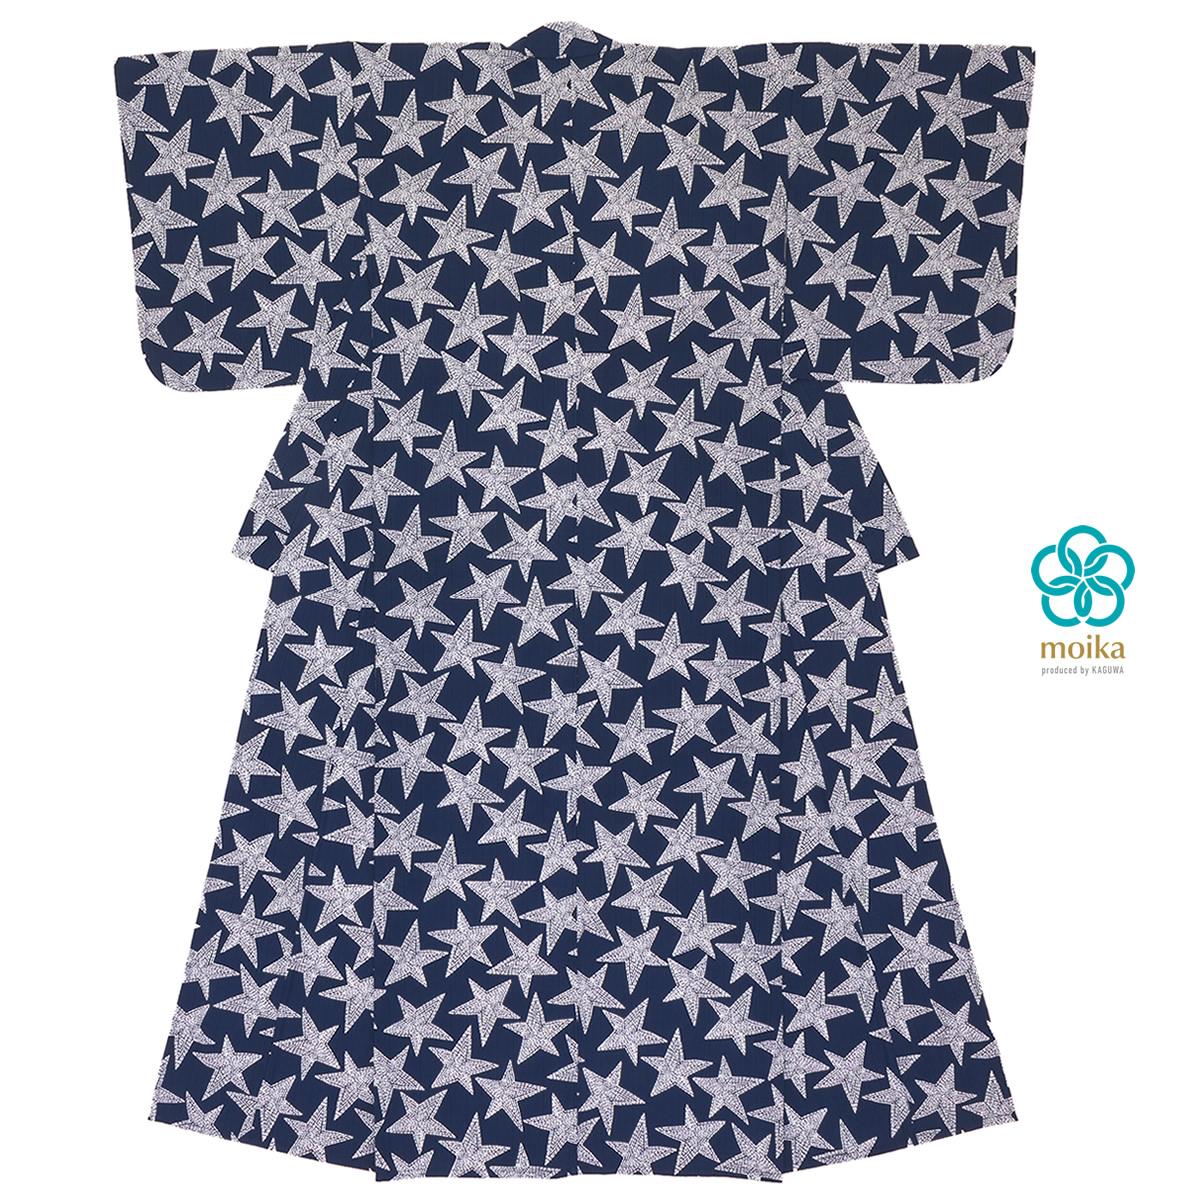 moika 浴衣 レディース 単品 Mサイズ レトロ 紺 ネイビー 刺し子 星 スター 小紋 衿芯付き 女性用 仕立て上がり